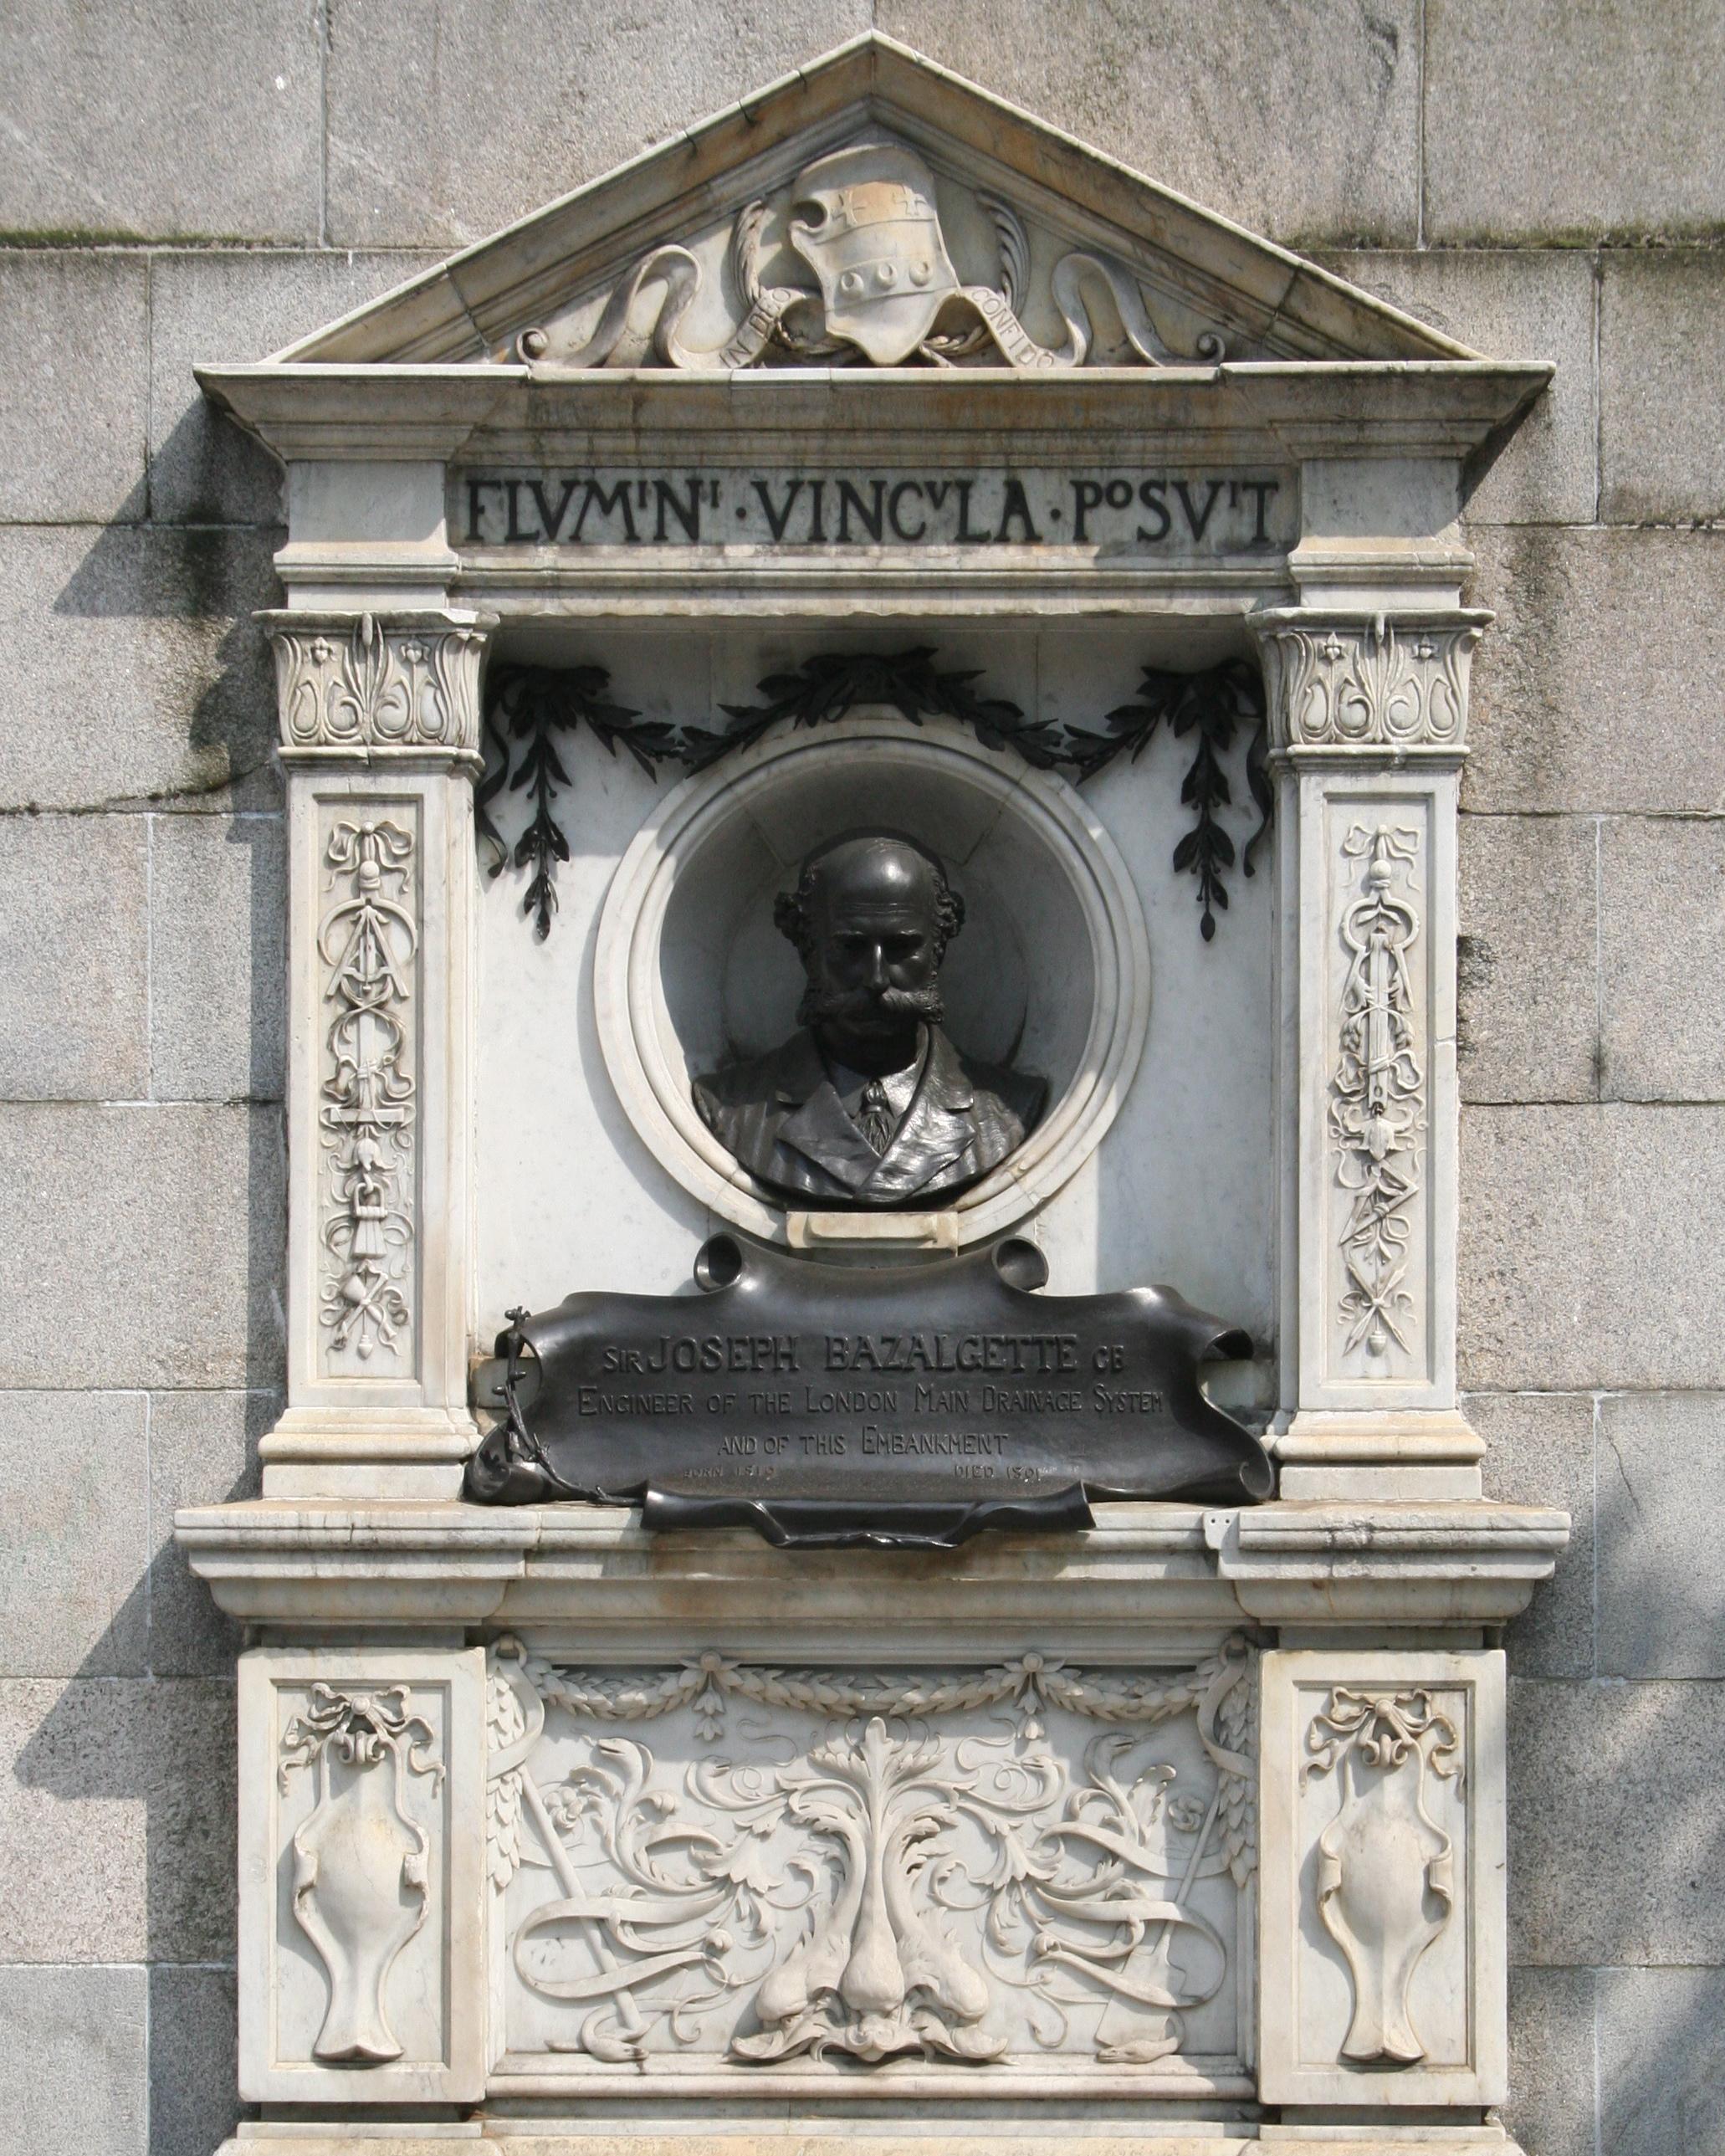 Sir_Joseph_Bazalgette_Memorial